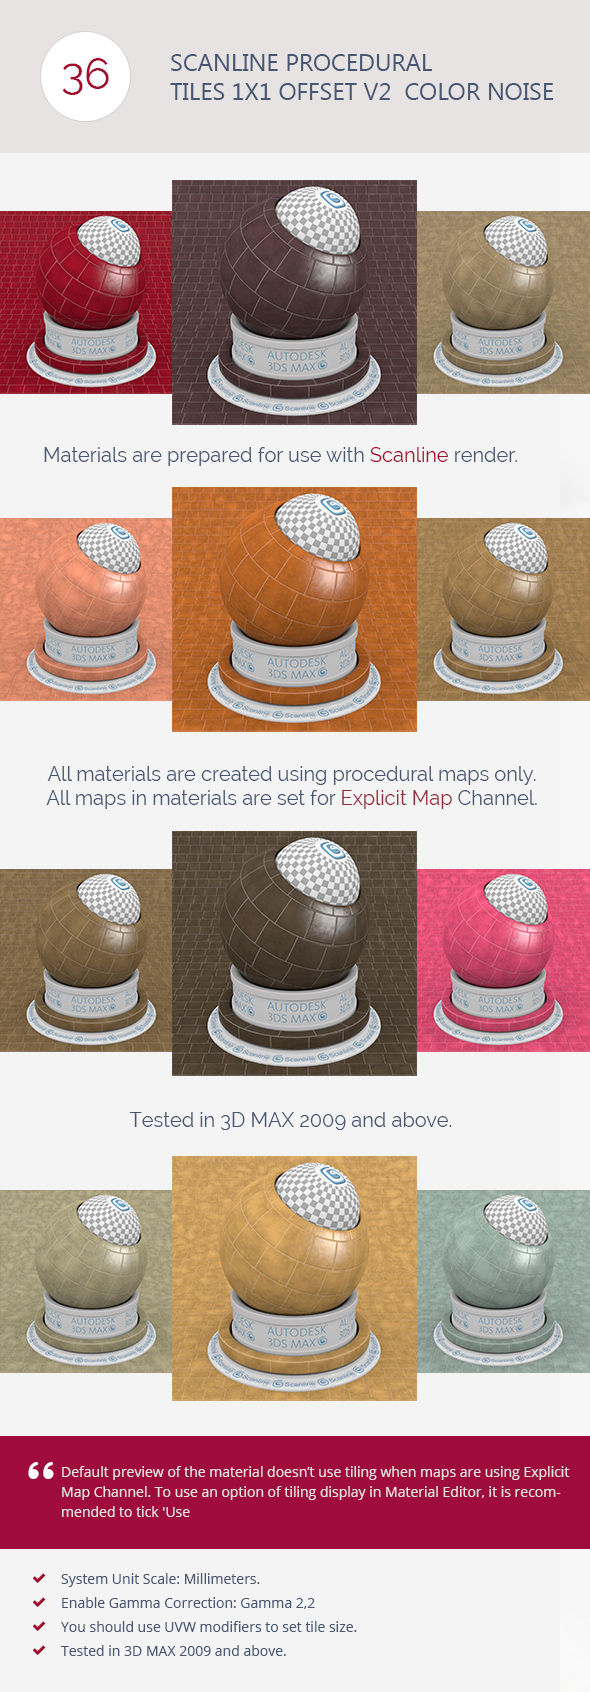 3DOcean Scanline Procedural Tiles 1x1 Offset V2 Color Noi 6744325